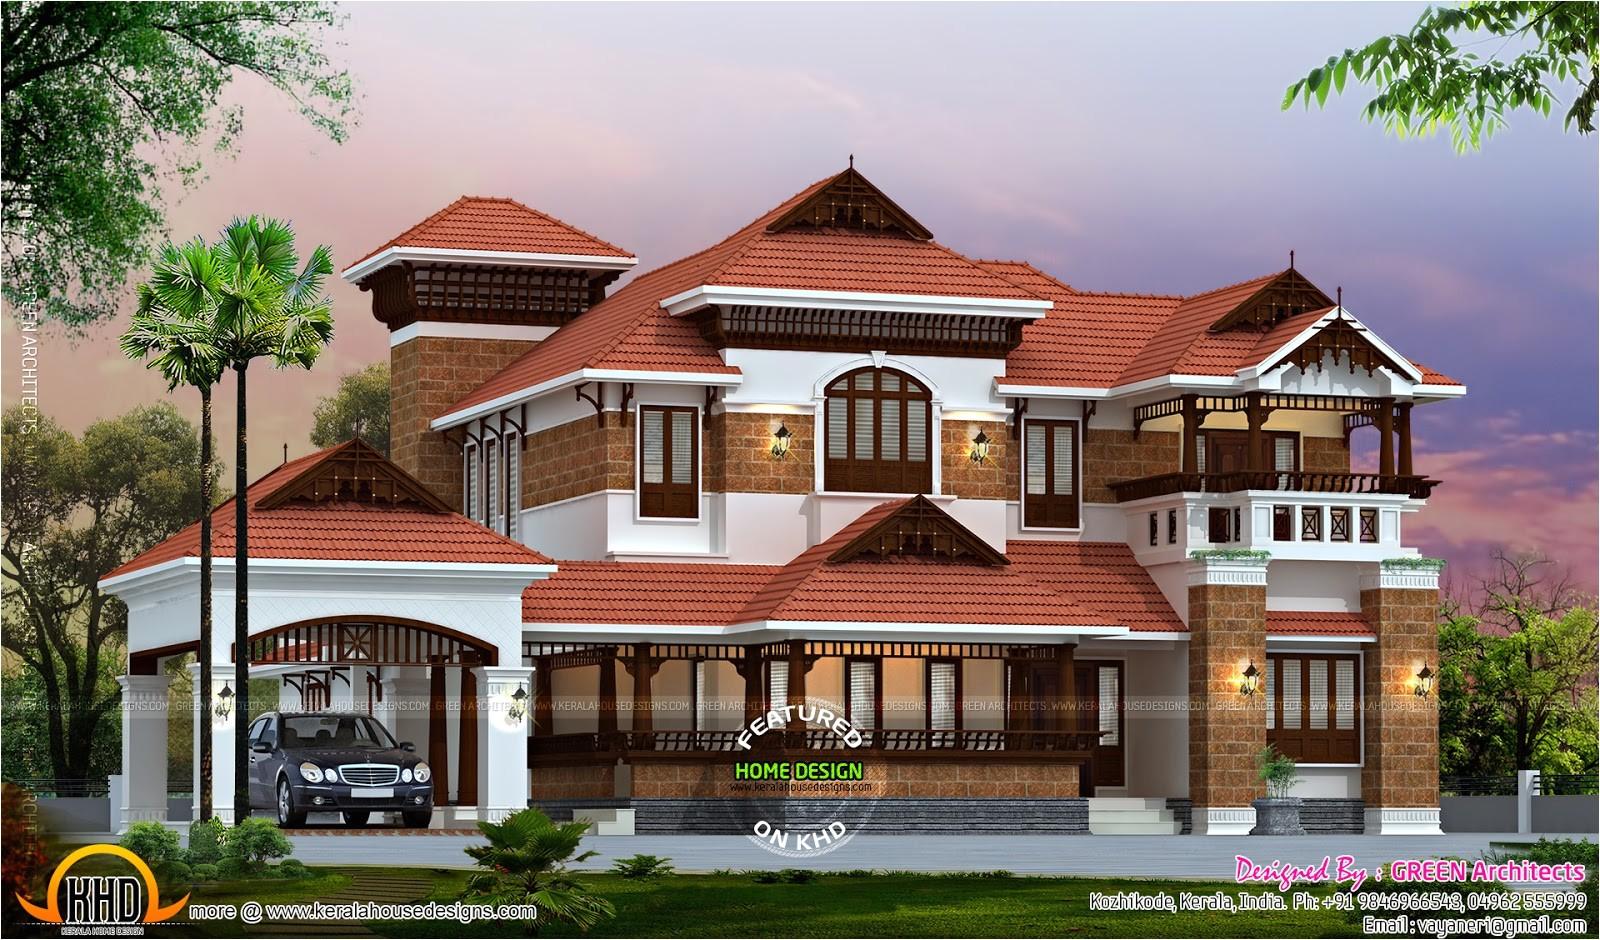 beautiful traditional nalettu model kerala house plan kerala small nalukettu house plans nalukettu house plans free download